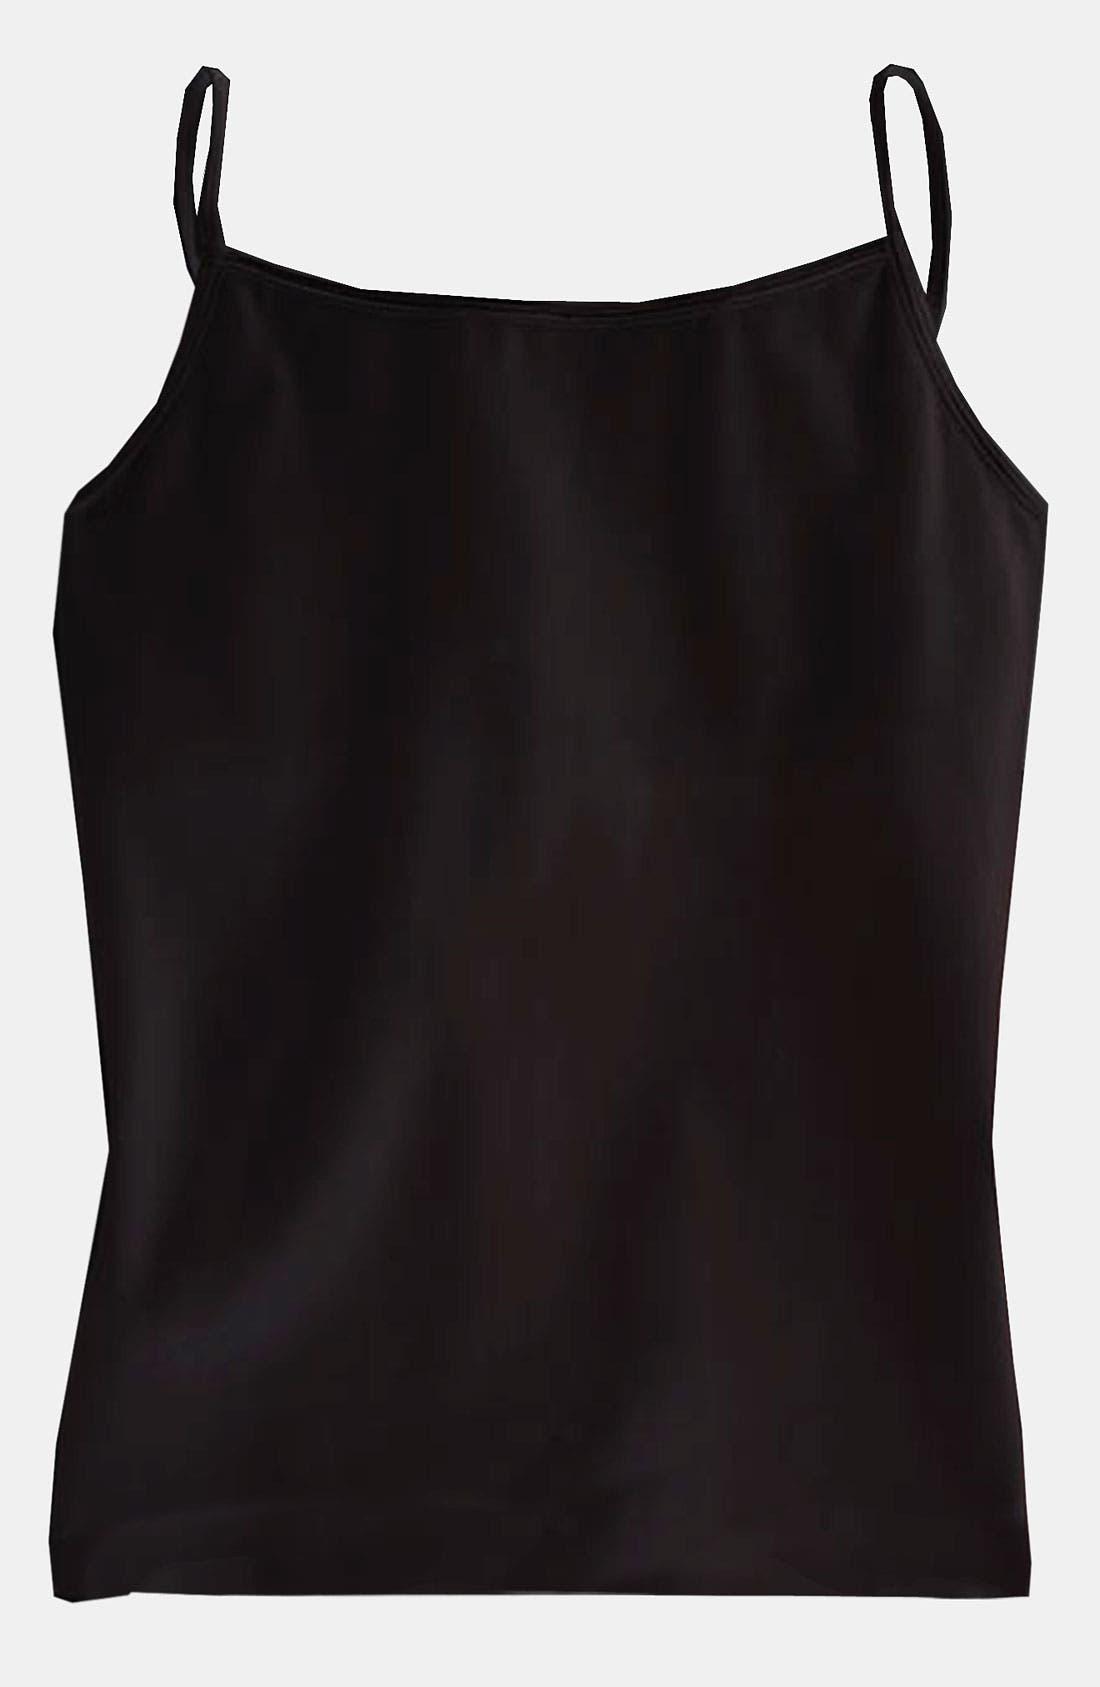 Alternate Image 1 Selected - Tucker + Tate Adjustable Camisole (Big Girls)